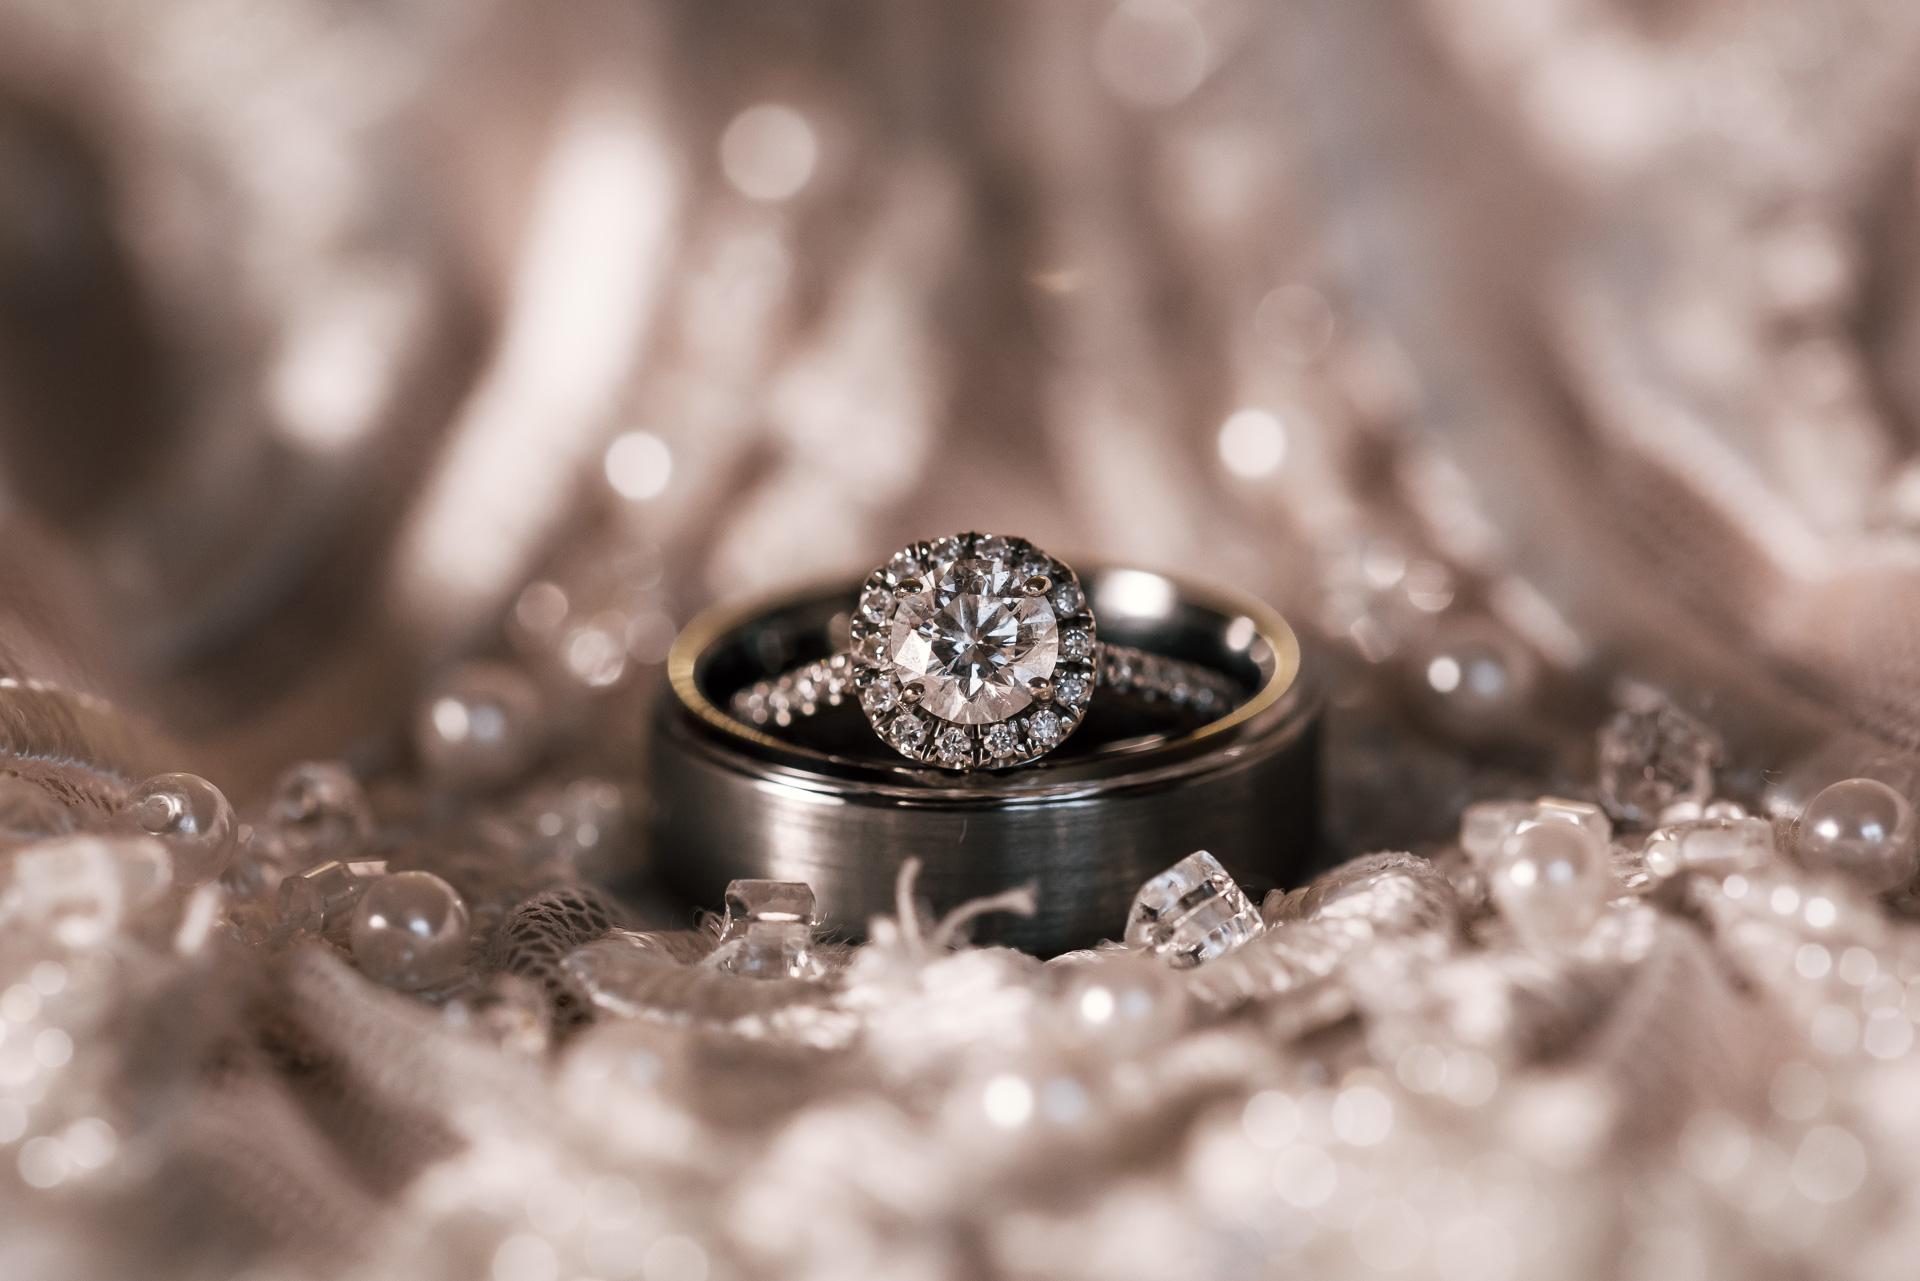 elegant diamond ring on the brides wedding dress at the Twin Oaks Golf course in san marcos, San diegos premier wedding venue